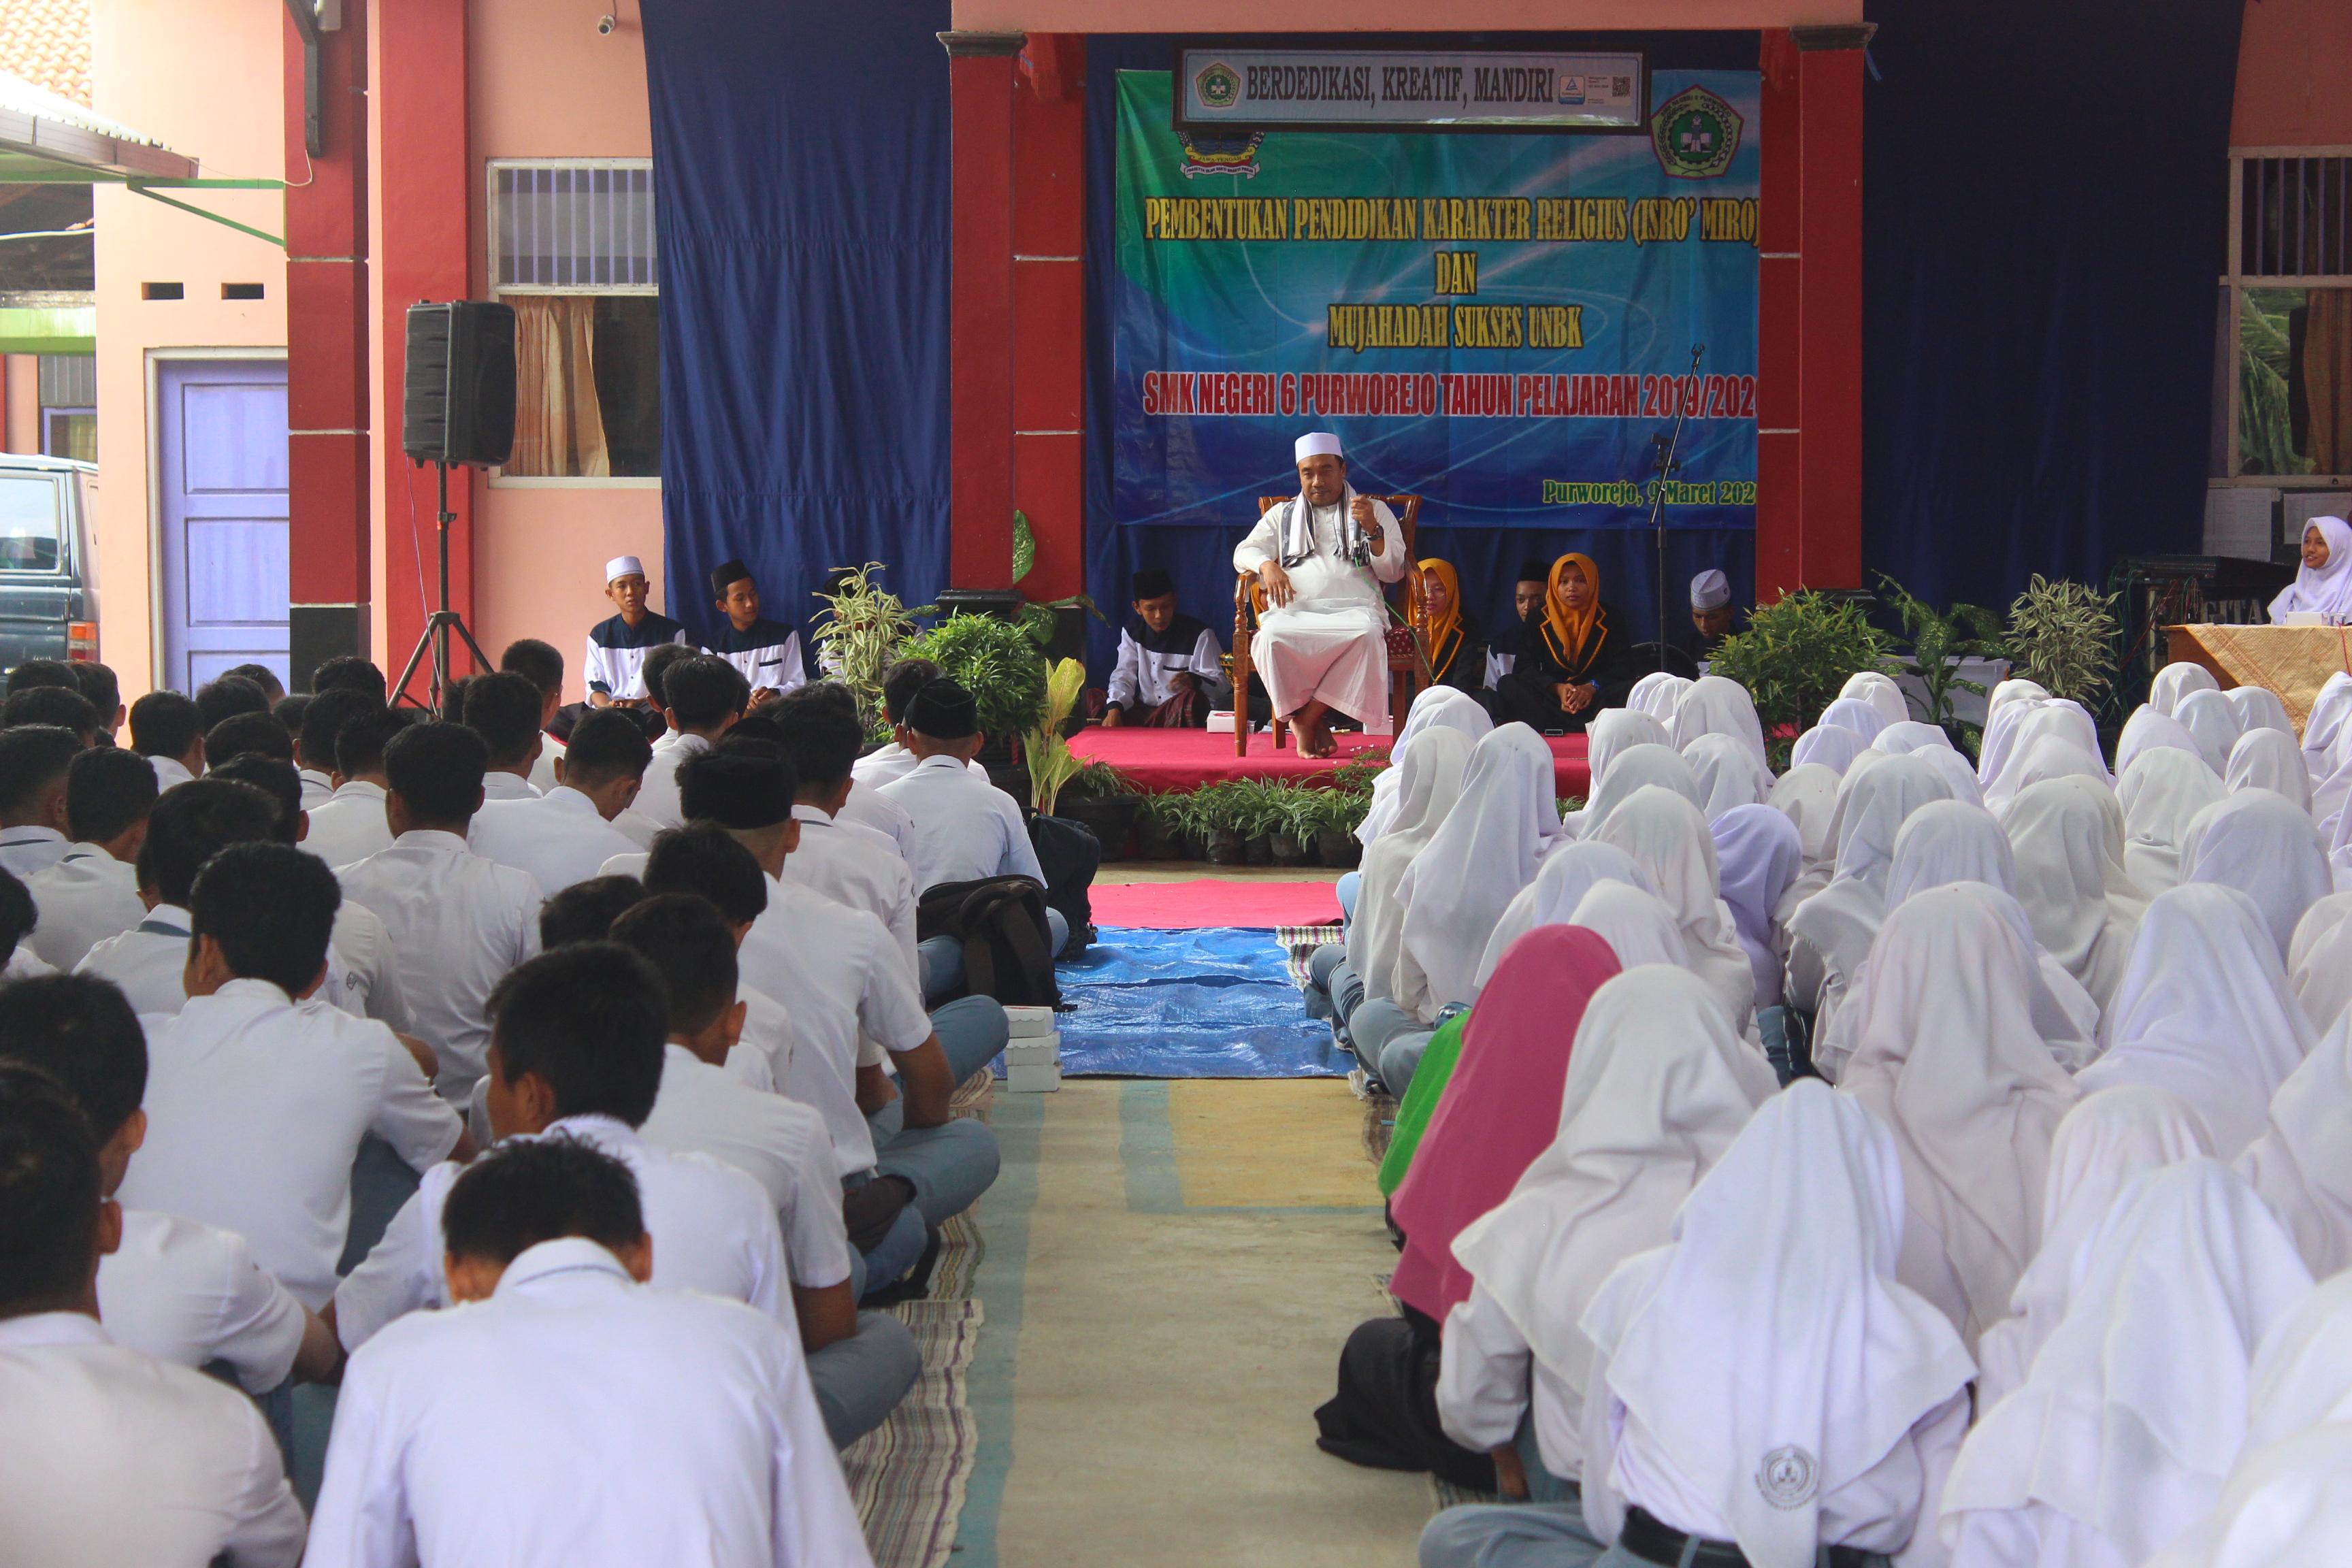 Pembentukan Karakter Religius melalui Peringatan Isro' Miroj